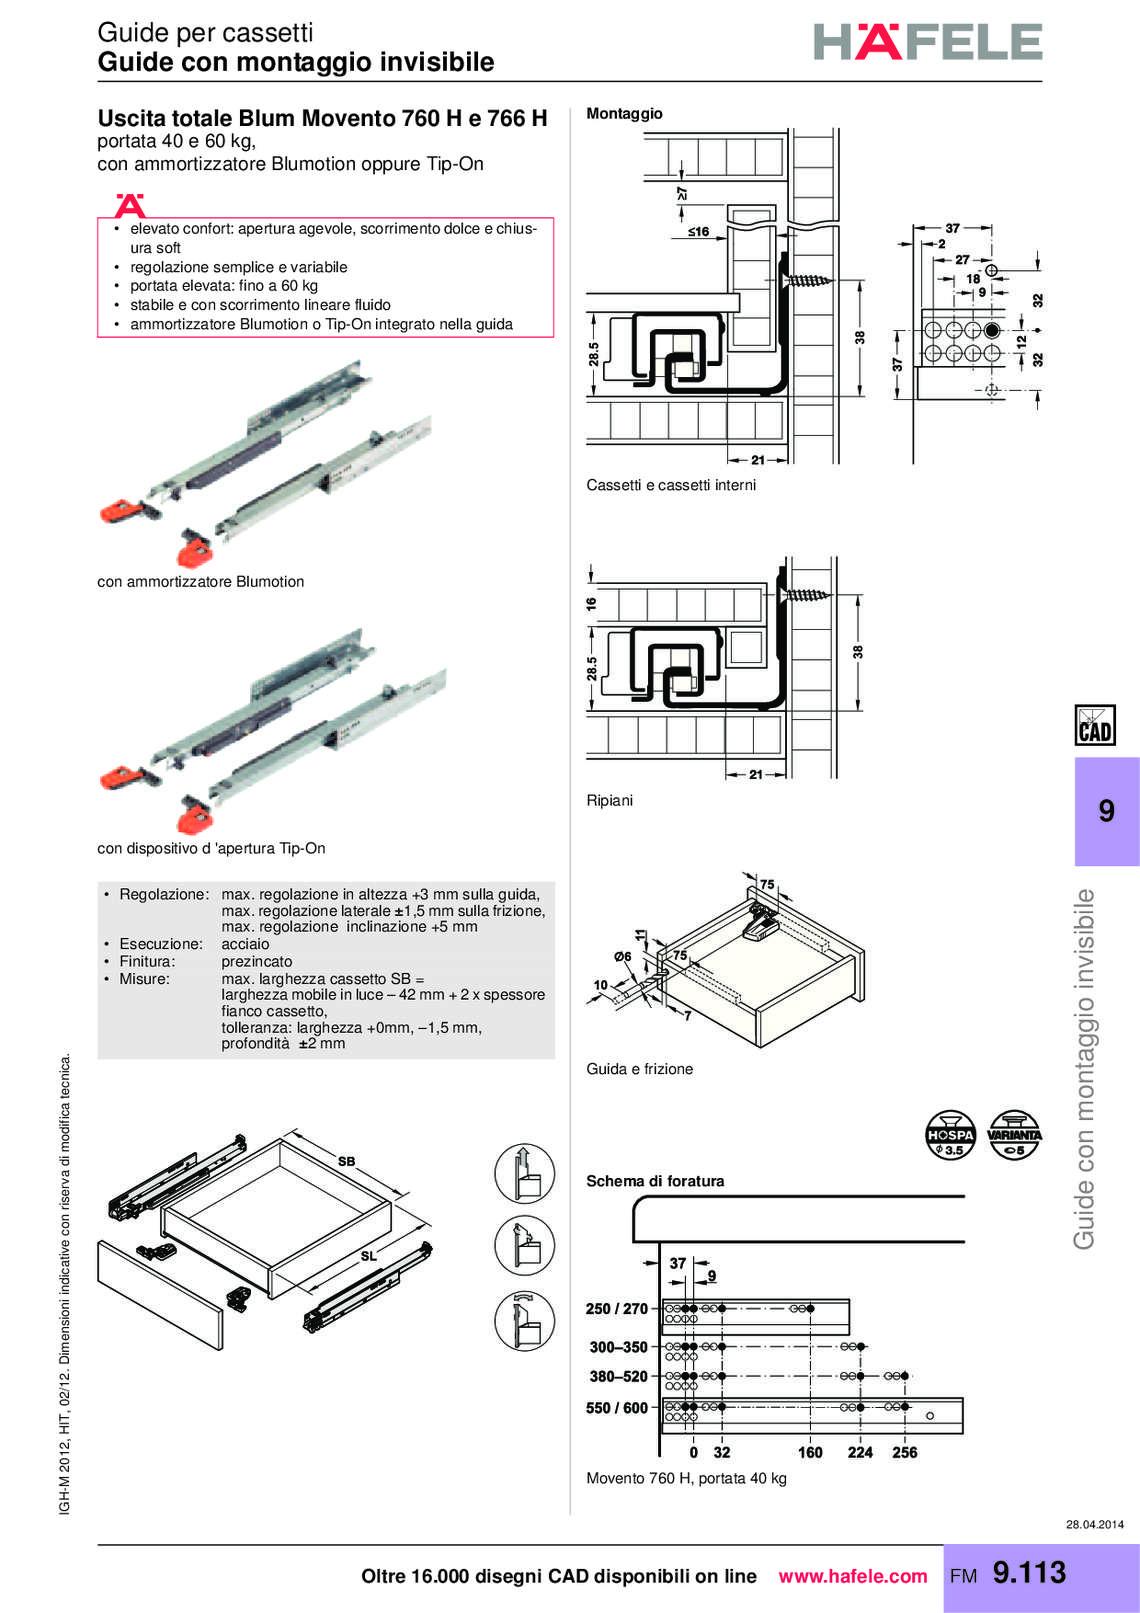 hafele-spondine-e-guide-per-mobili_40_160.jpg